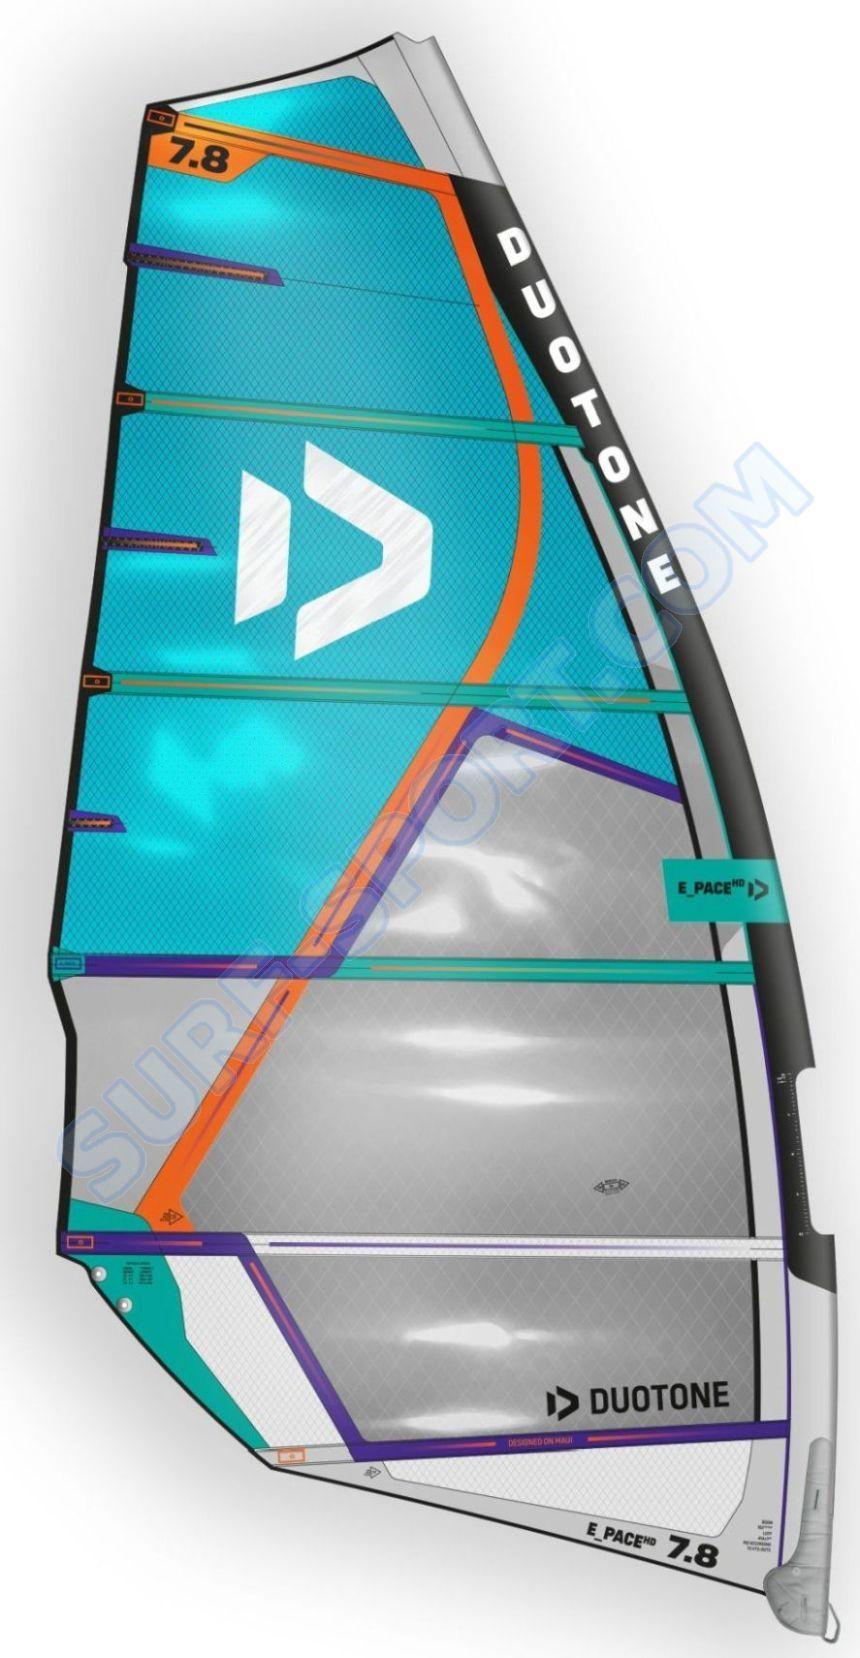 Żagiel Do Windsurfingu Duotone E-Pace HD 2021 C02:Blue-Off.White